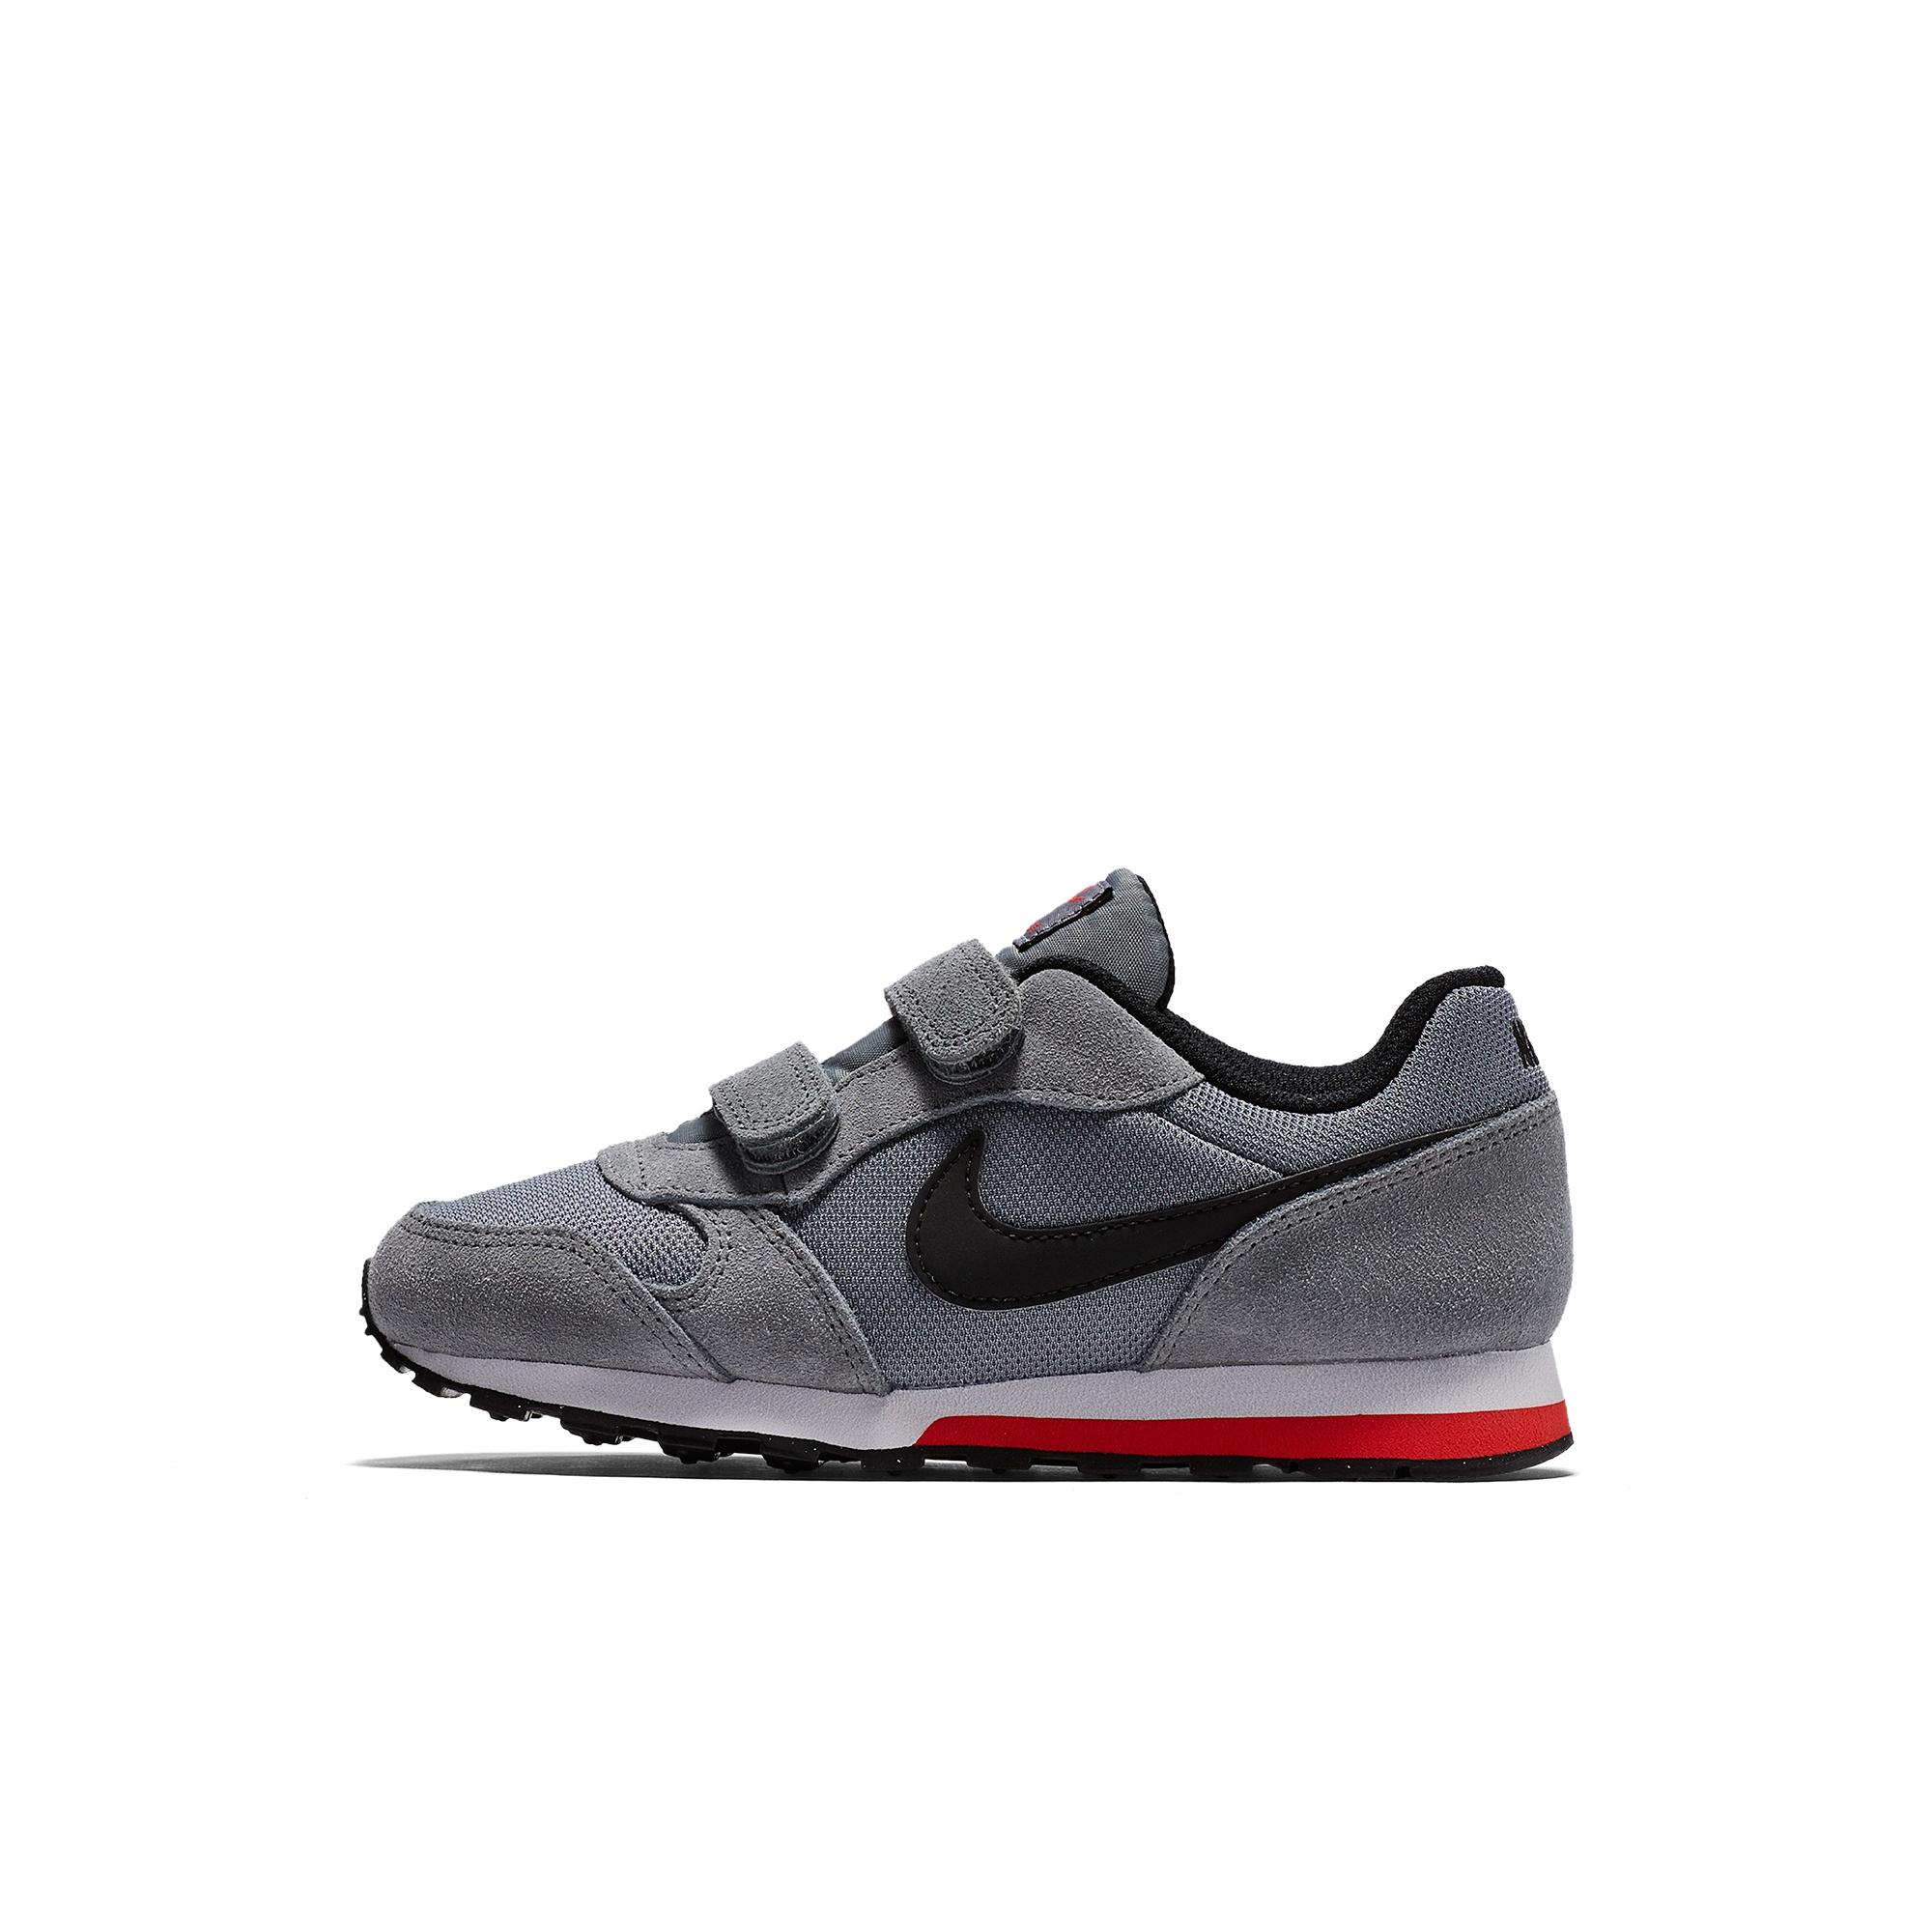 Nike 耐克官方 NIKE MD RUNNER 2 幼童 童鞋 807317